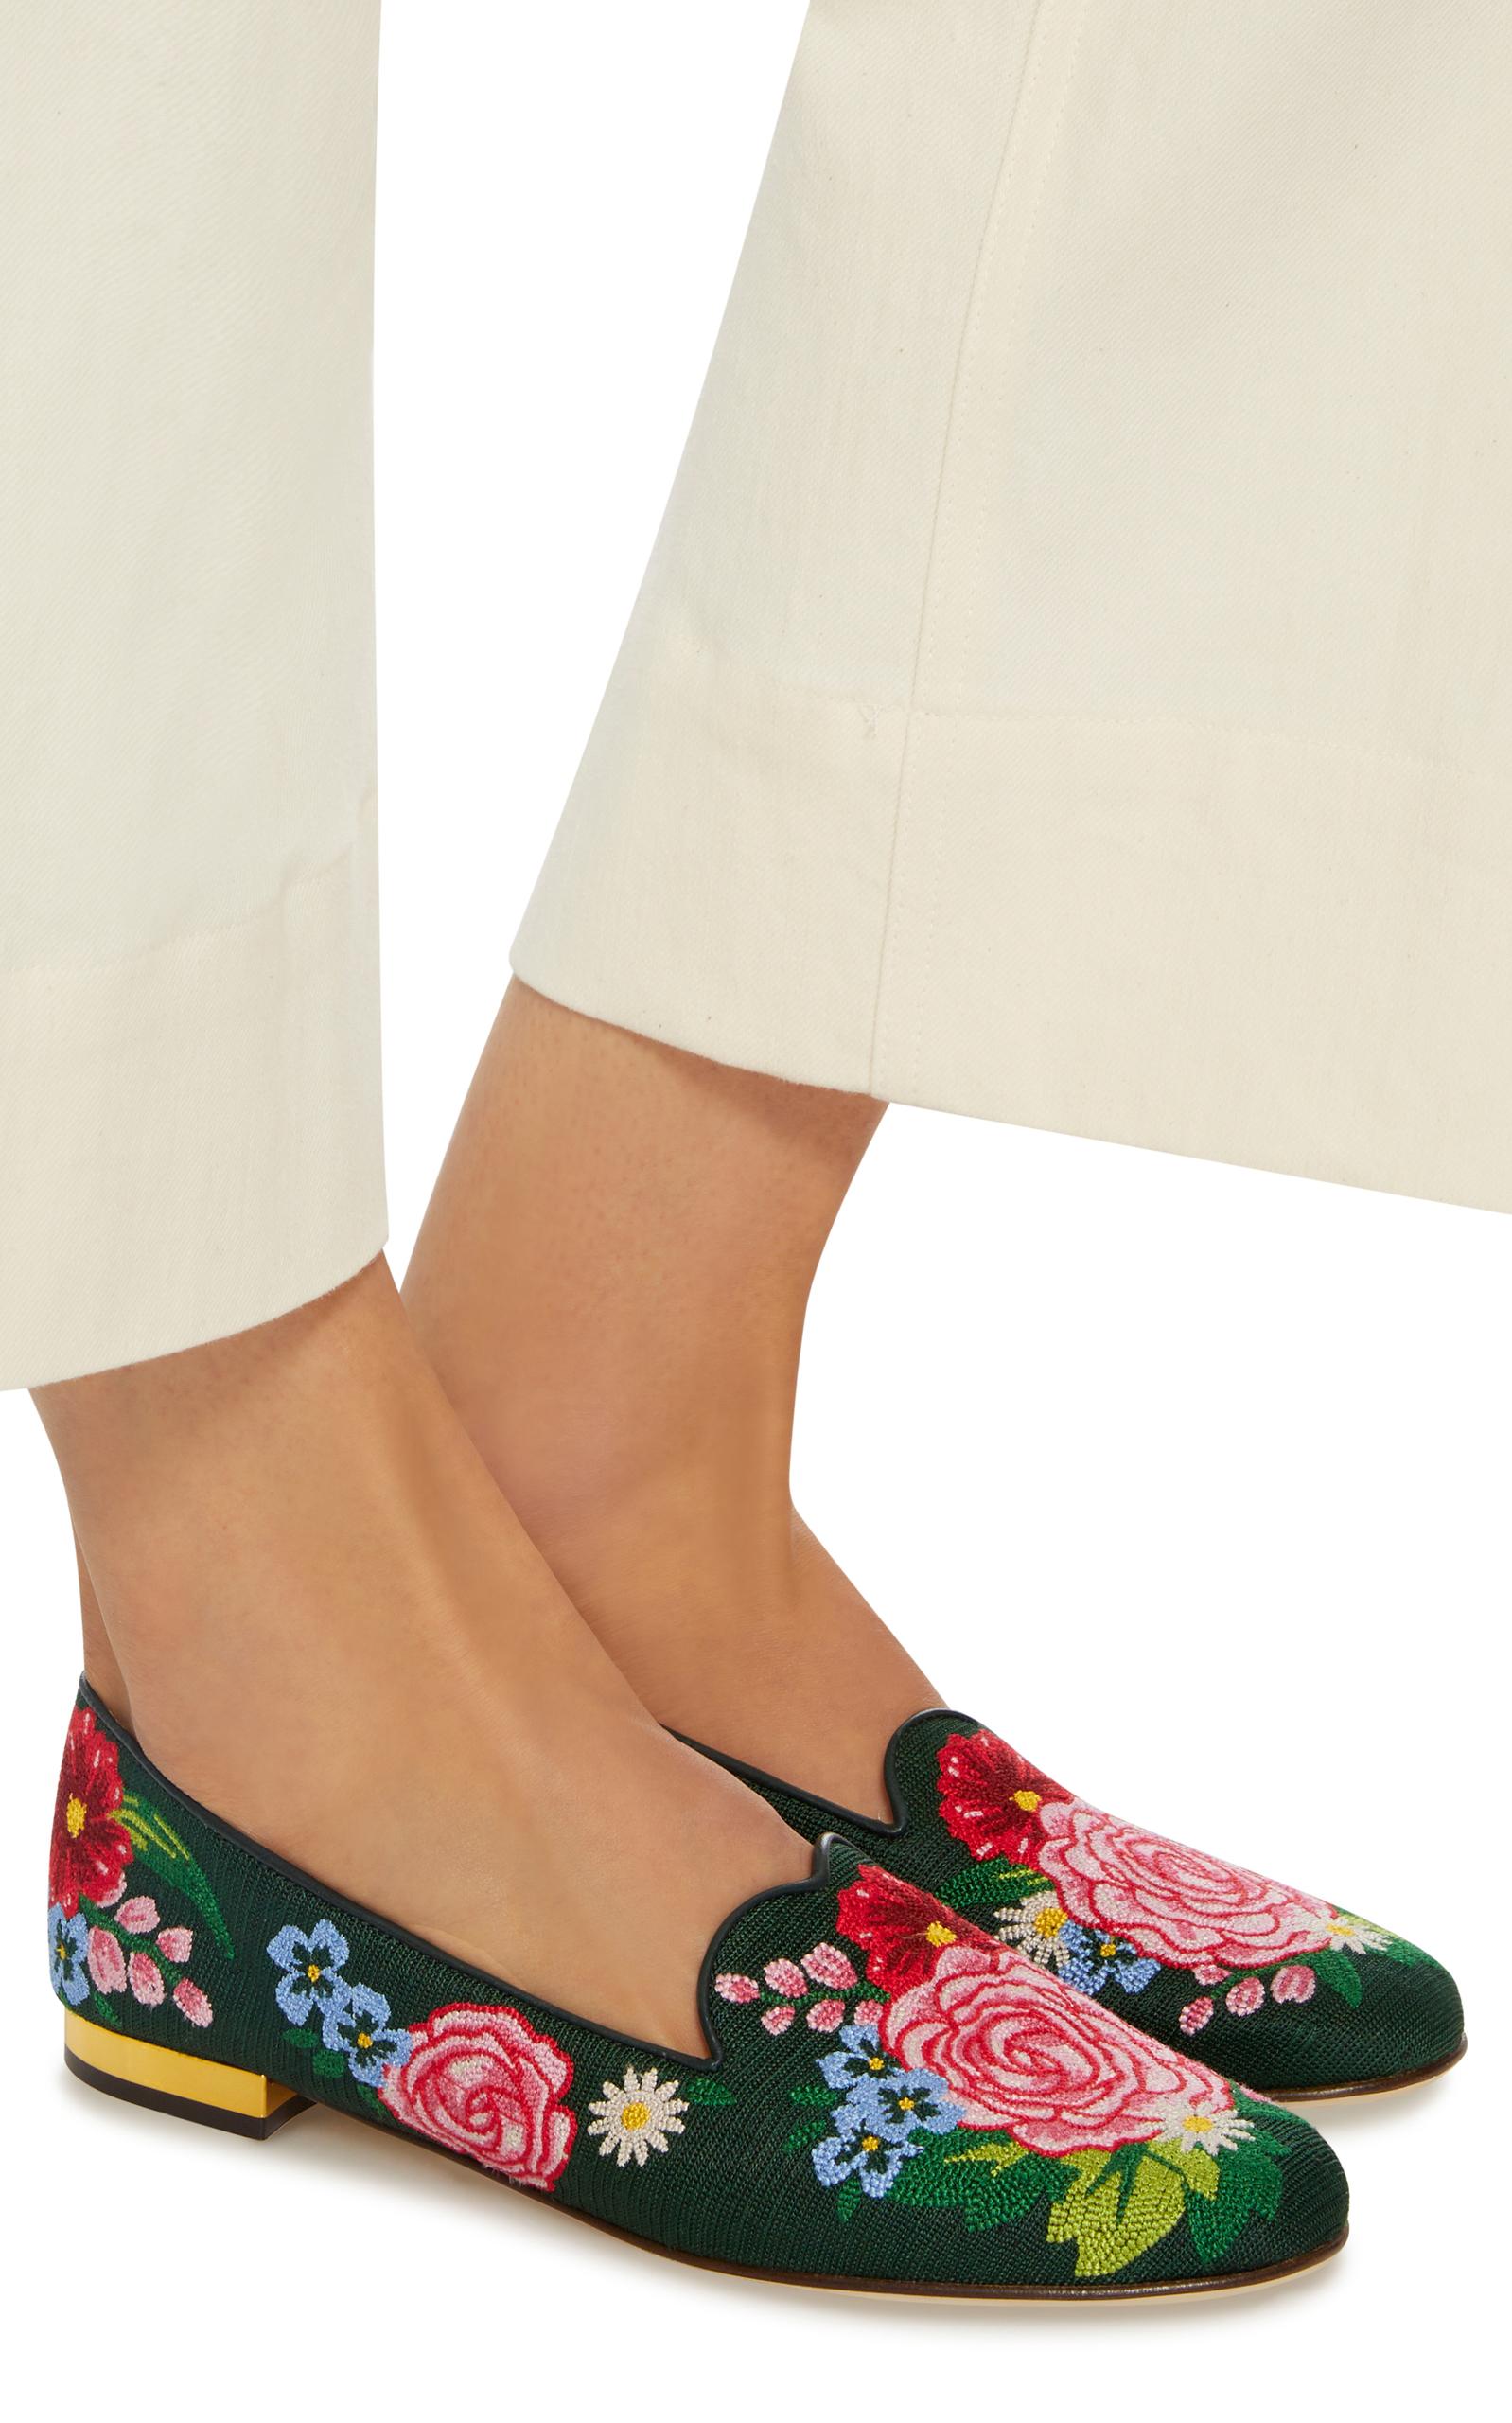 Charlotte Olympia Rose Mules Pantoufle De Jardin - Vert cV9zlss